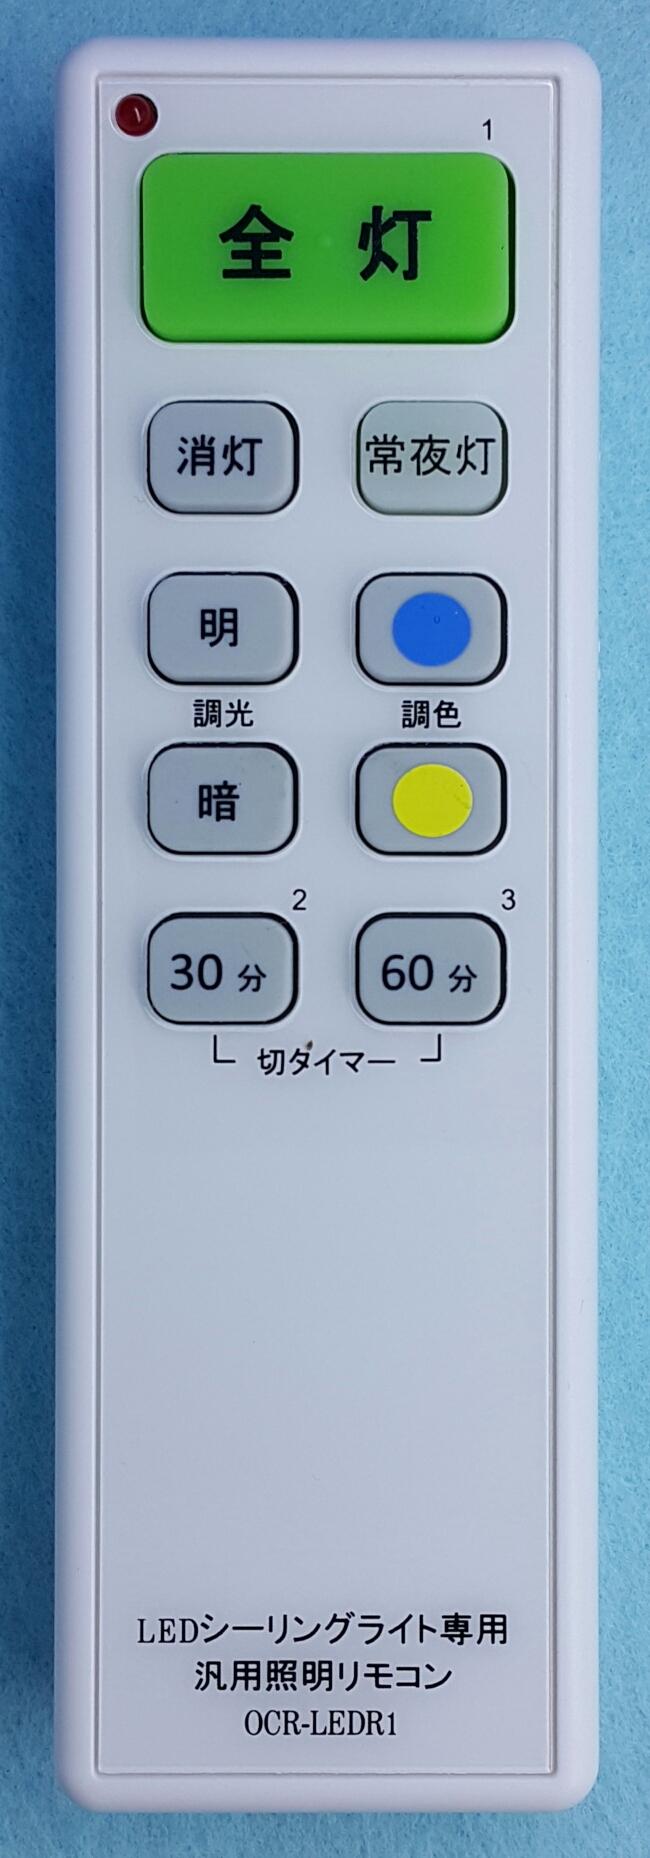 TOSHIBA_Toshiba1111_XE730 E916_LAMP_cover.png